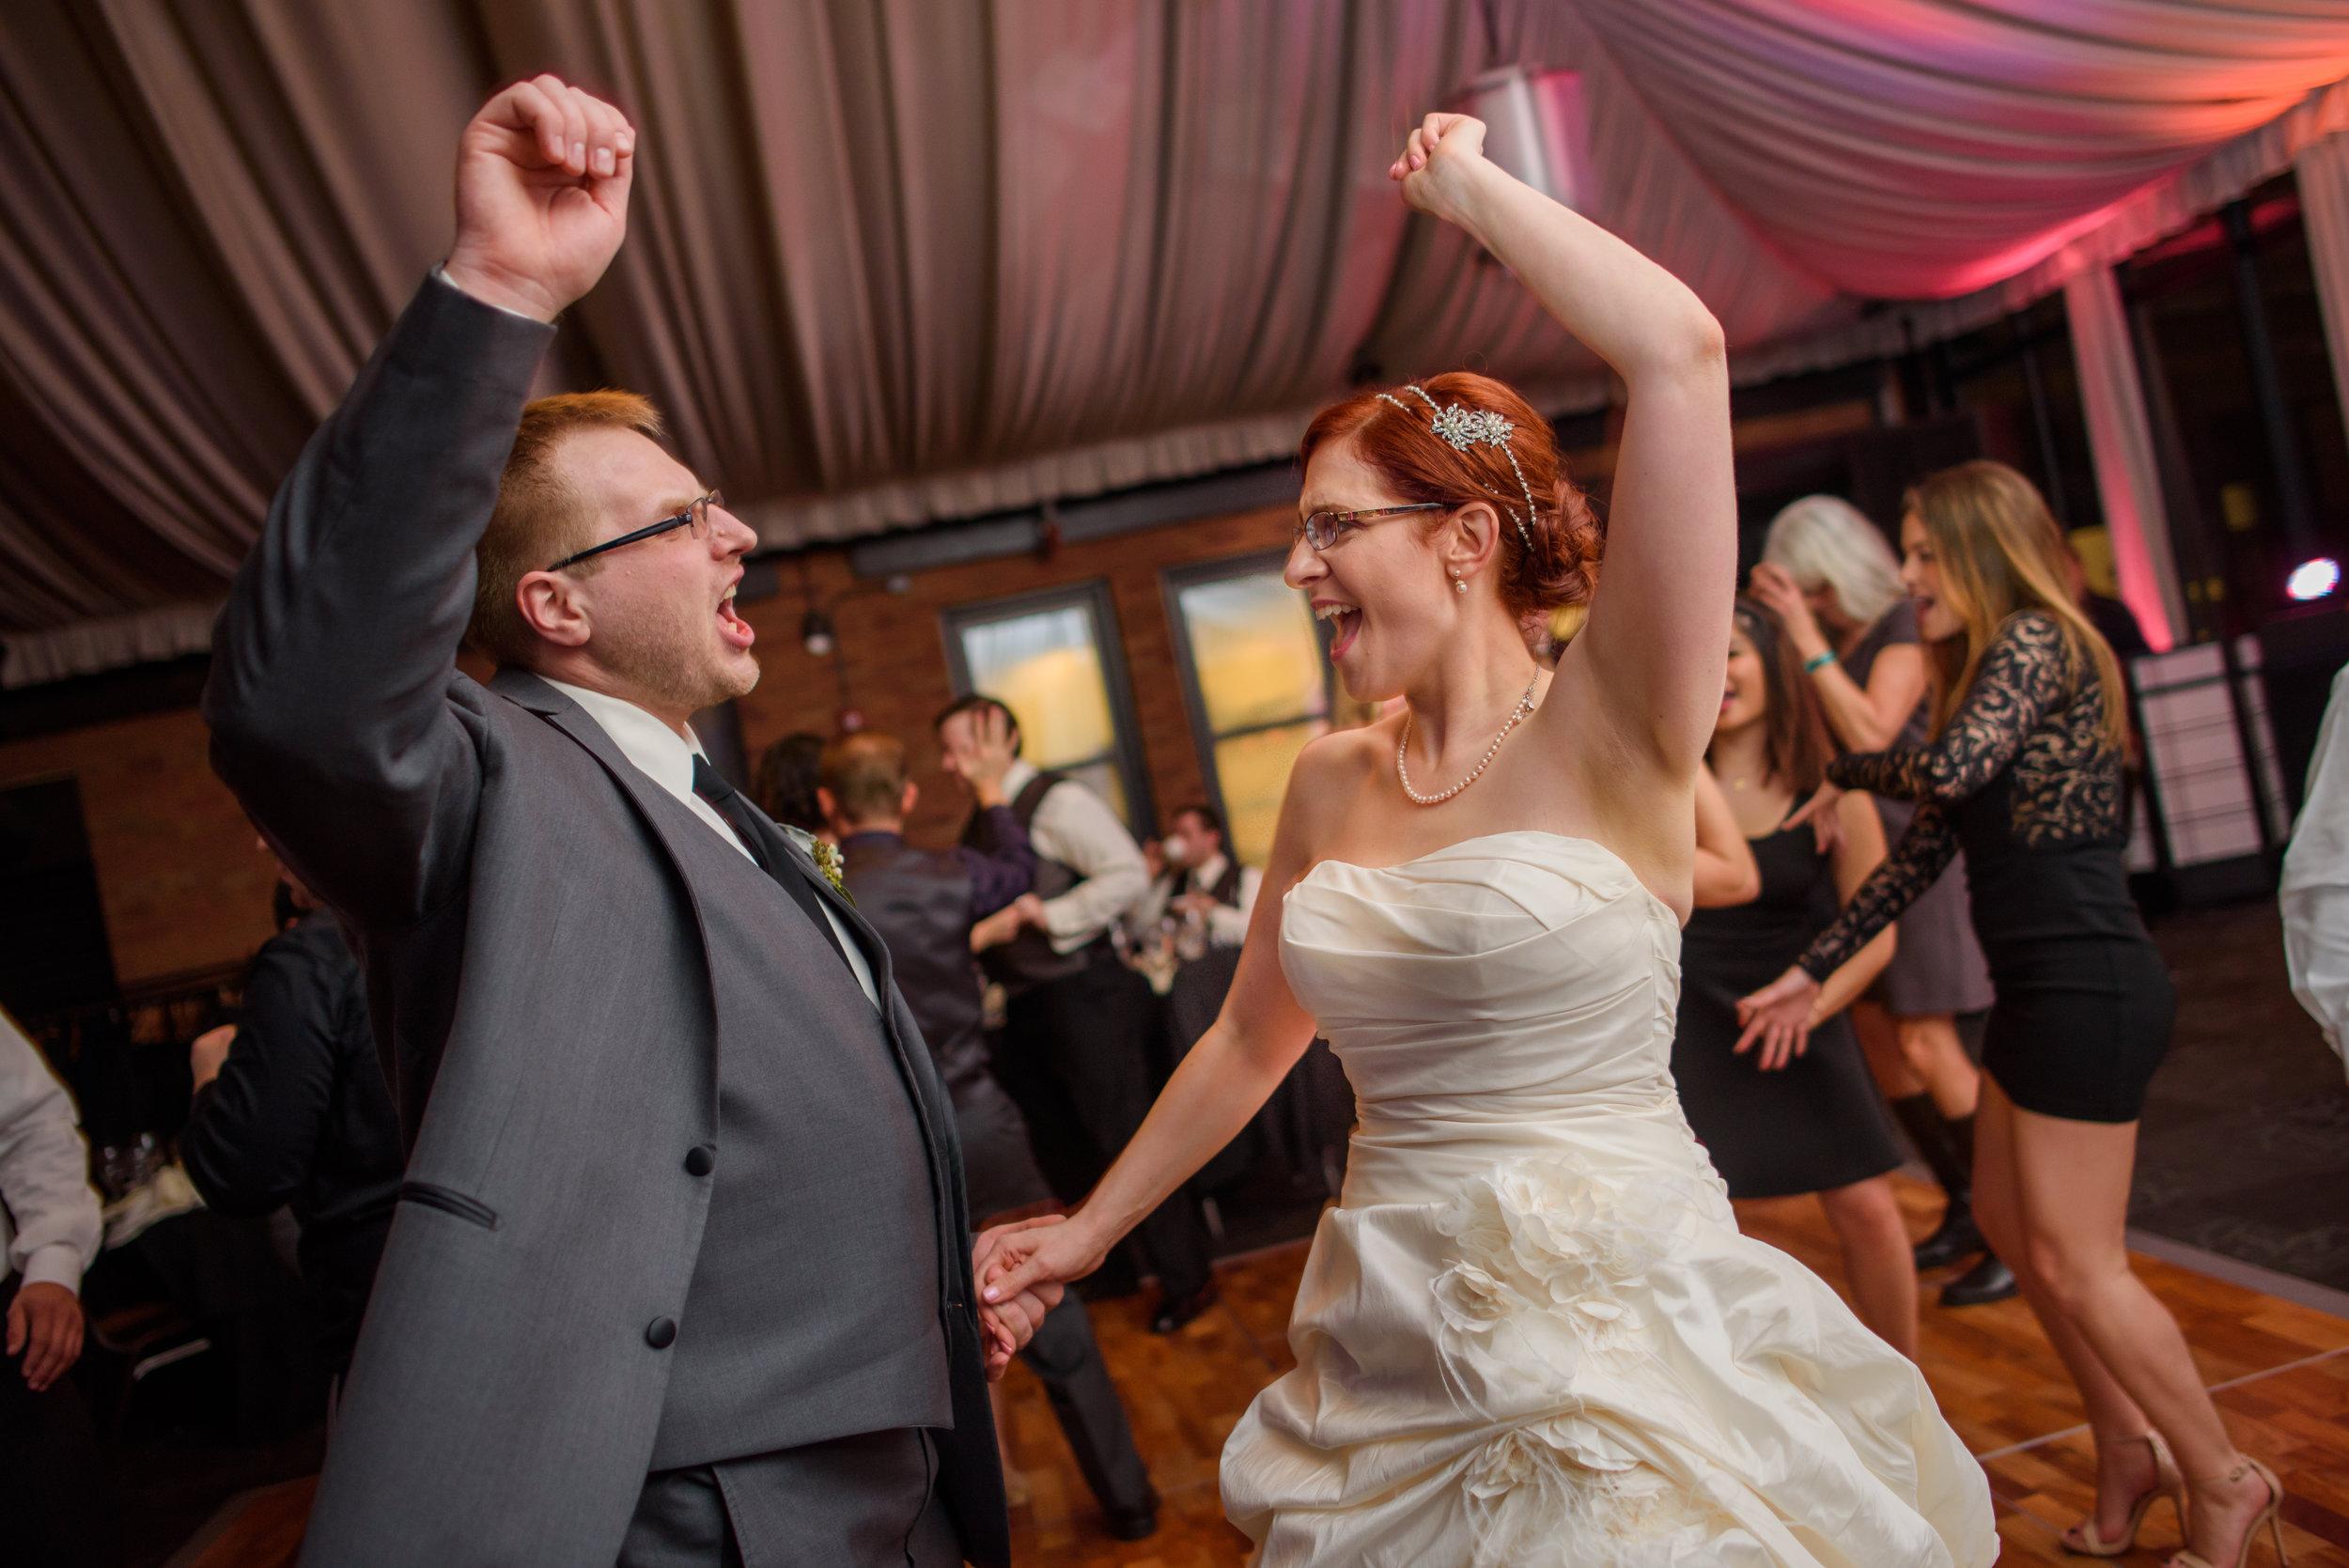 judith-john-019-citizen-hotel-sacramento-wedding-photographer-katherine-nicole-photography.JPG